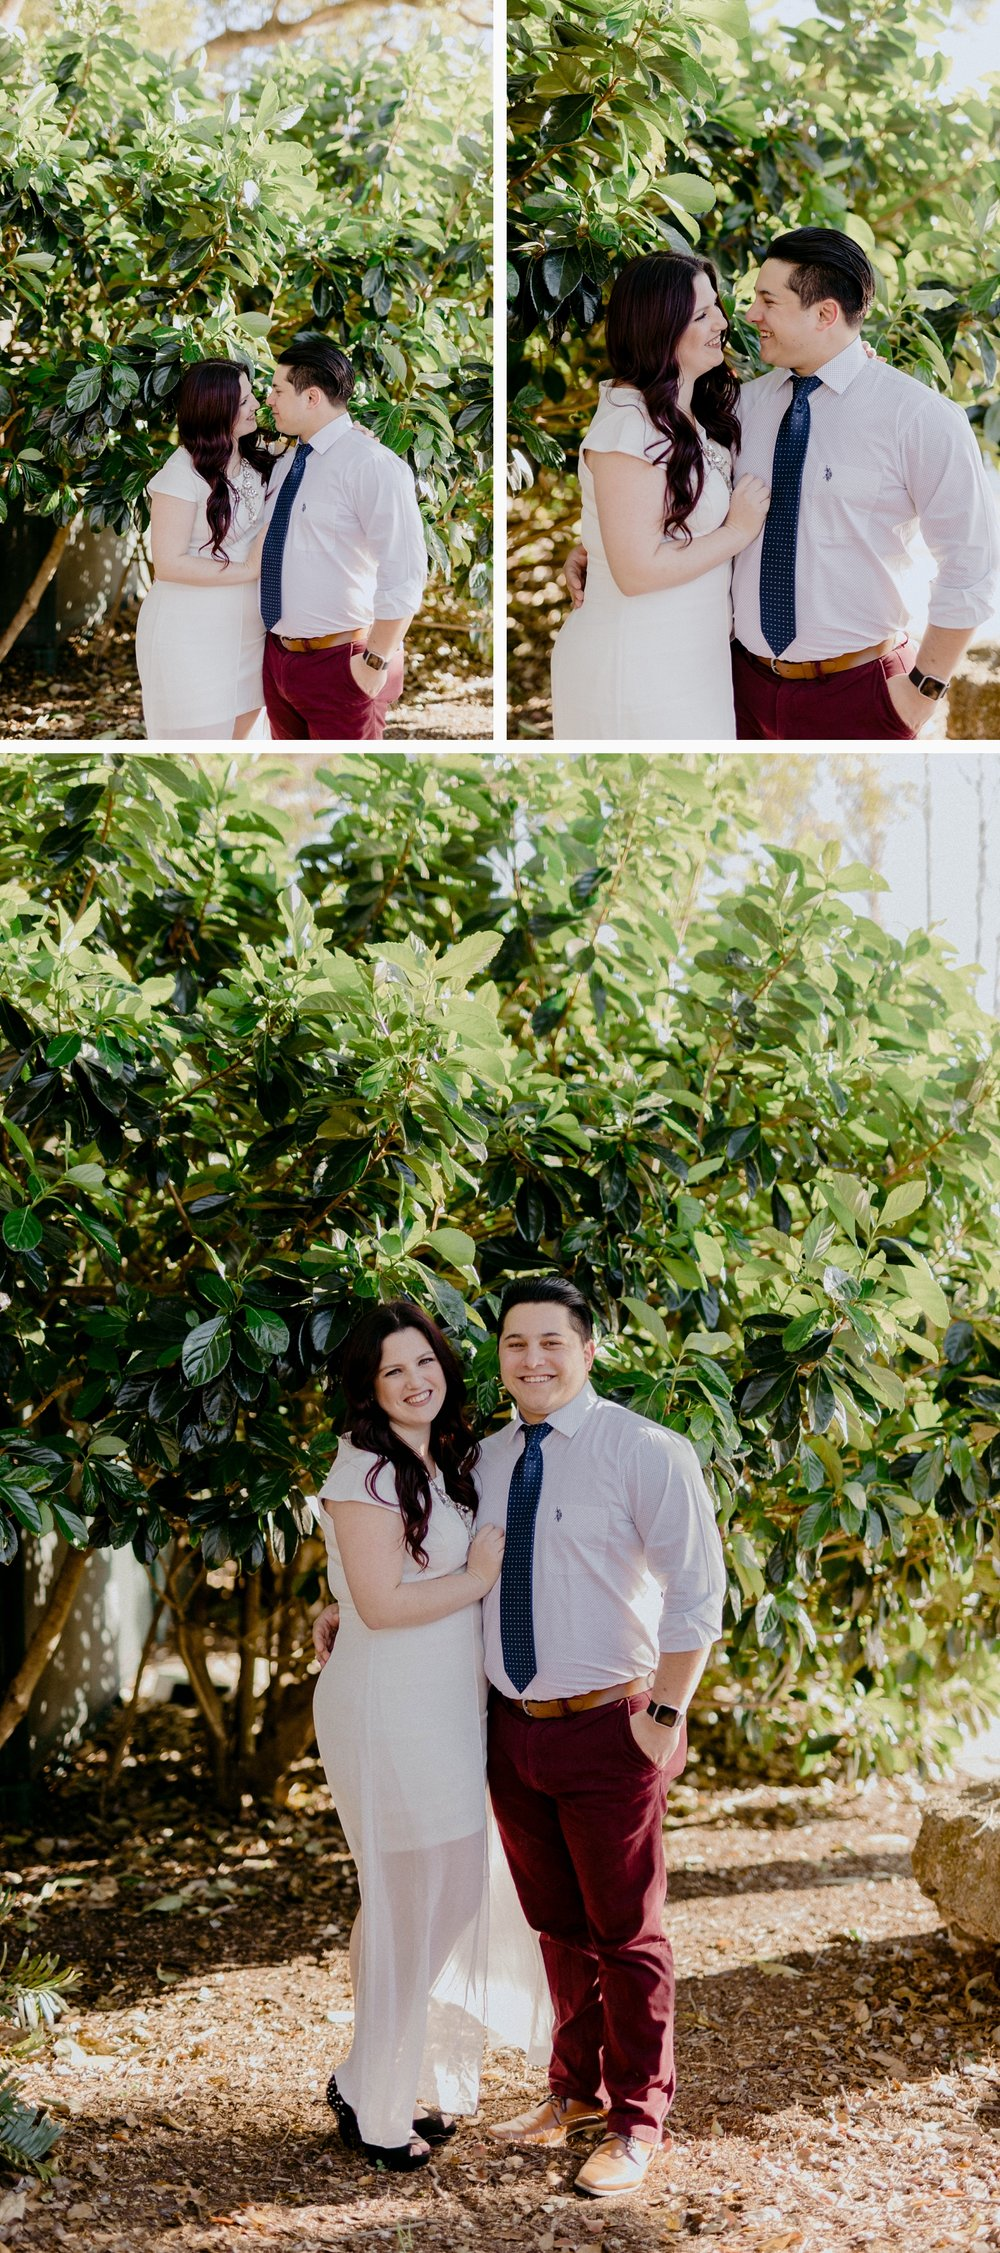 Bibi-And-Josh-Lake-Eola-Engagement_0015.jpg